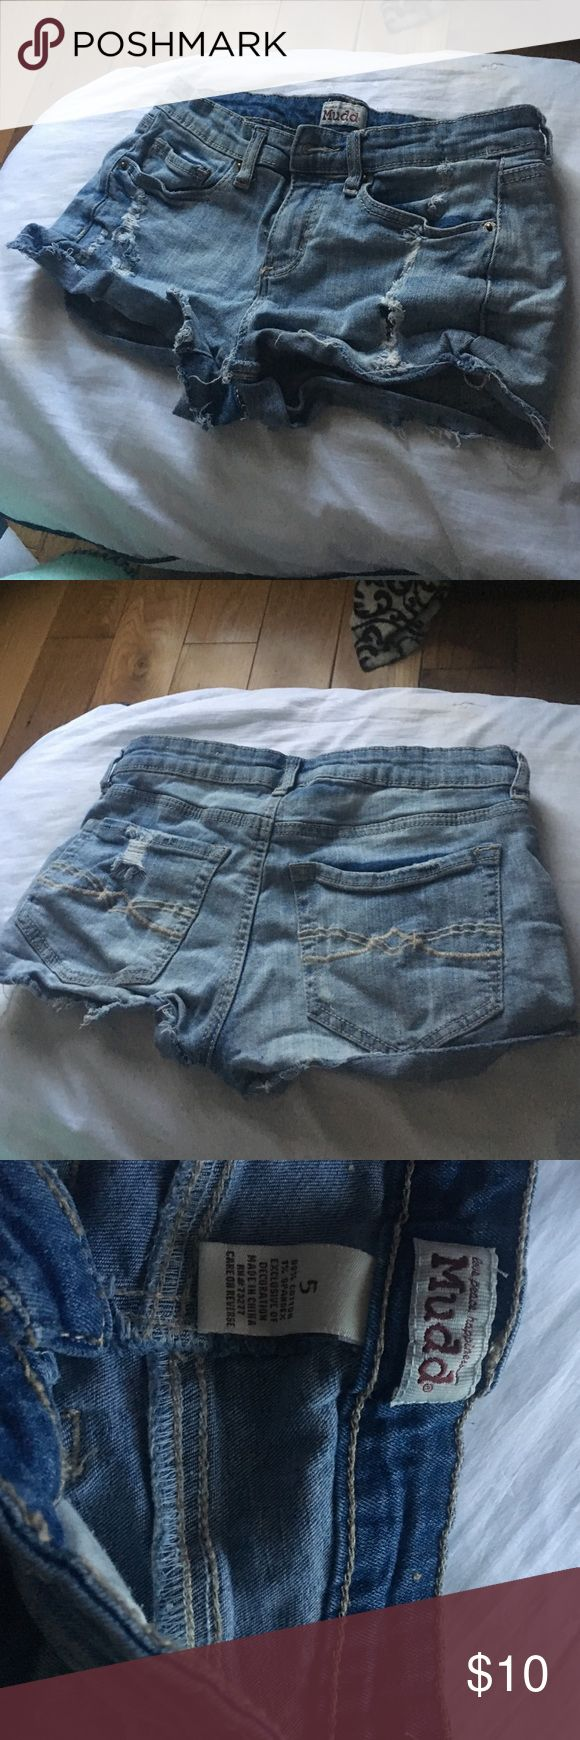 Selling this Mudd Brand Shorts on Poshmark! My username is: jessie_2001. #shopmycloset #poshmark #fashion #shopping #style #forsale #Mudd #Pants